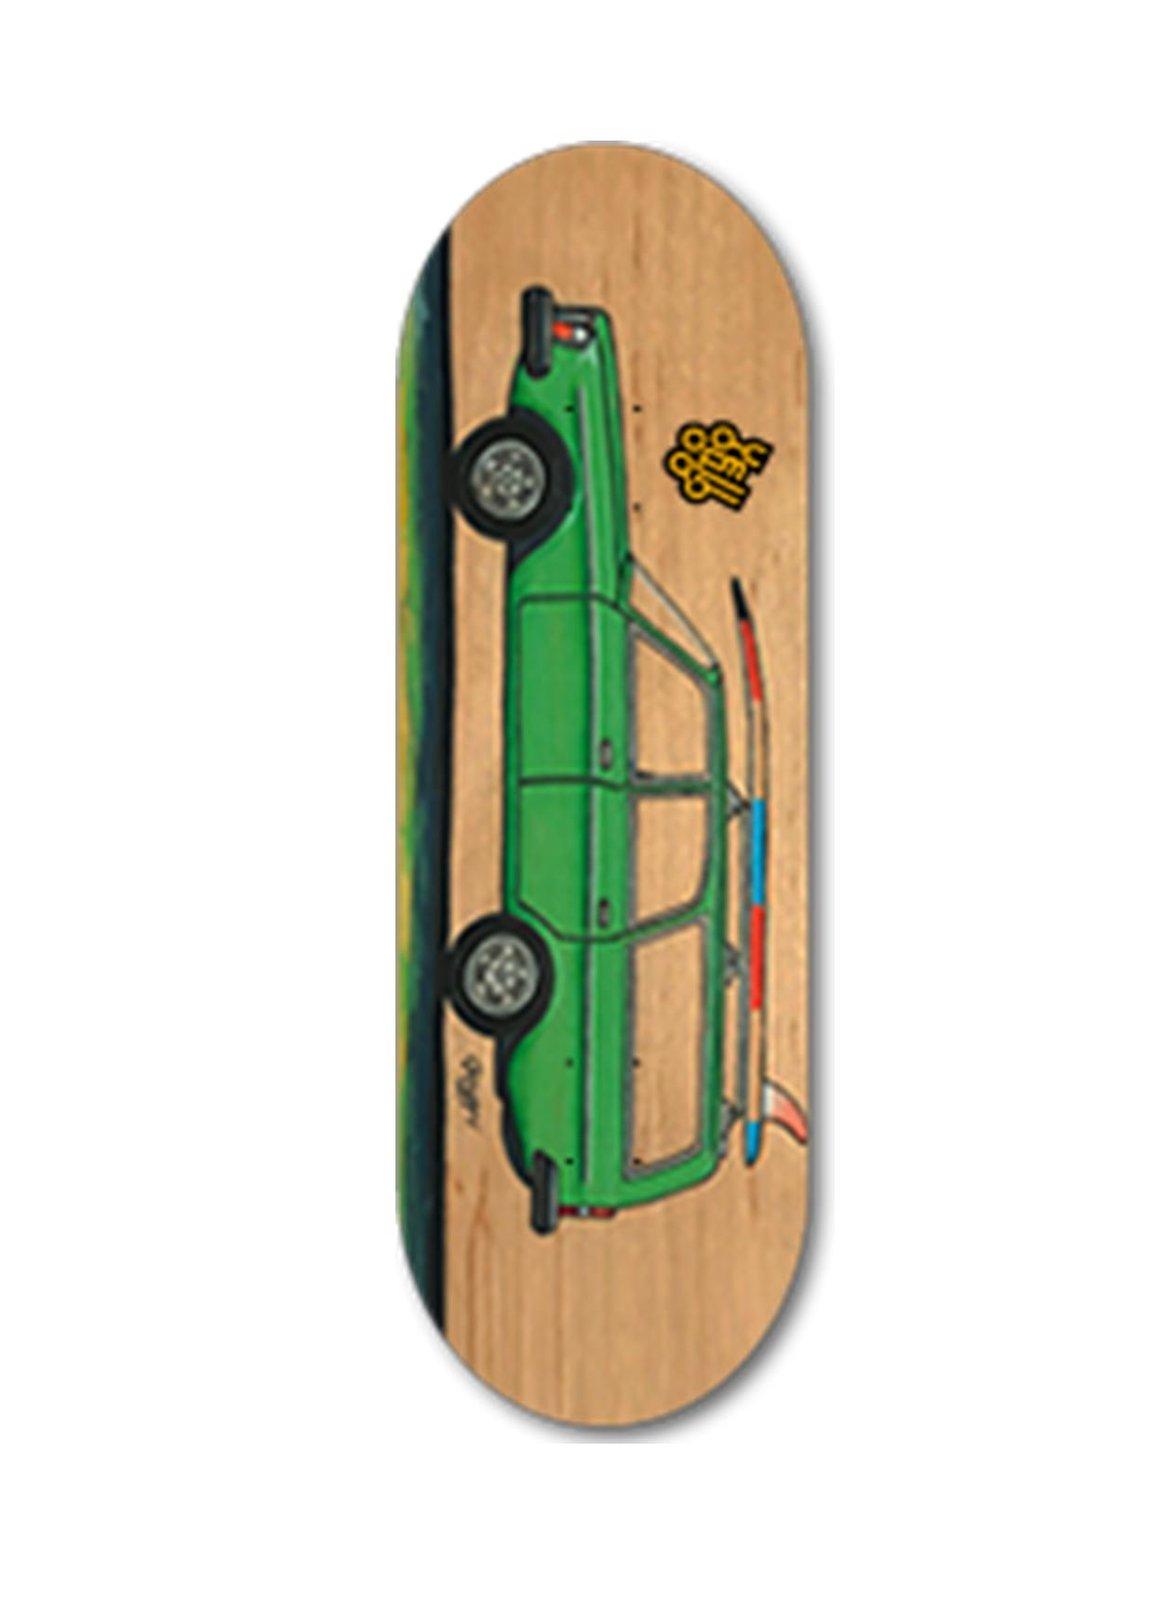 Yellowood 245dl Fingerboard Deck 34mm Fingerboards Uk